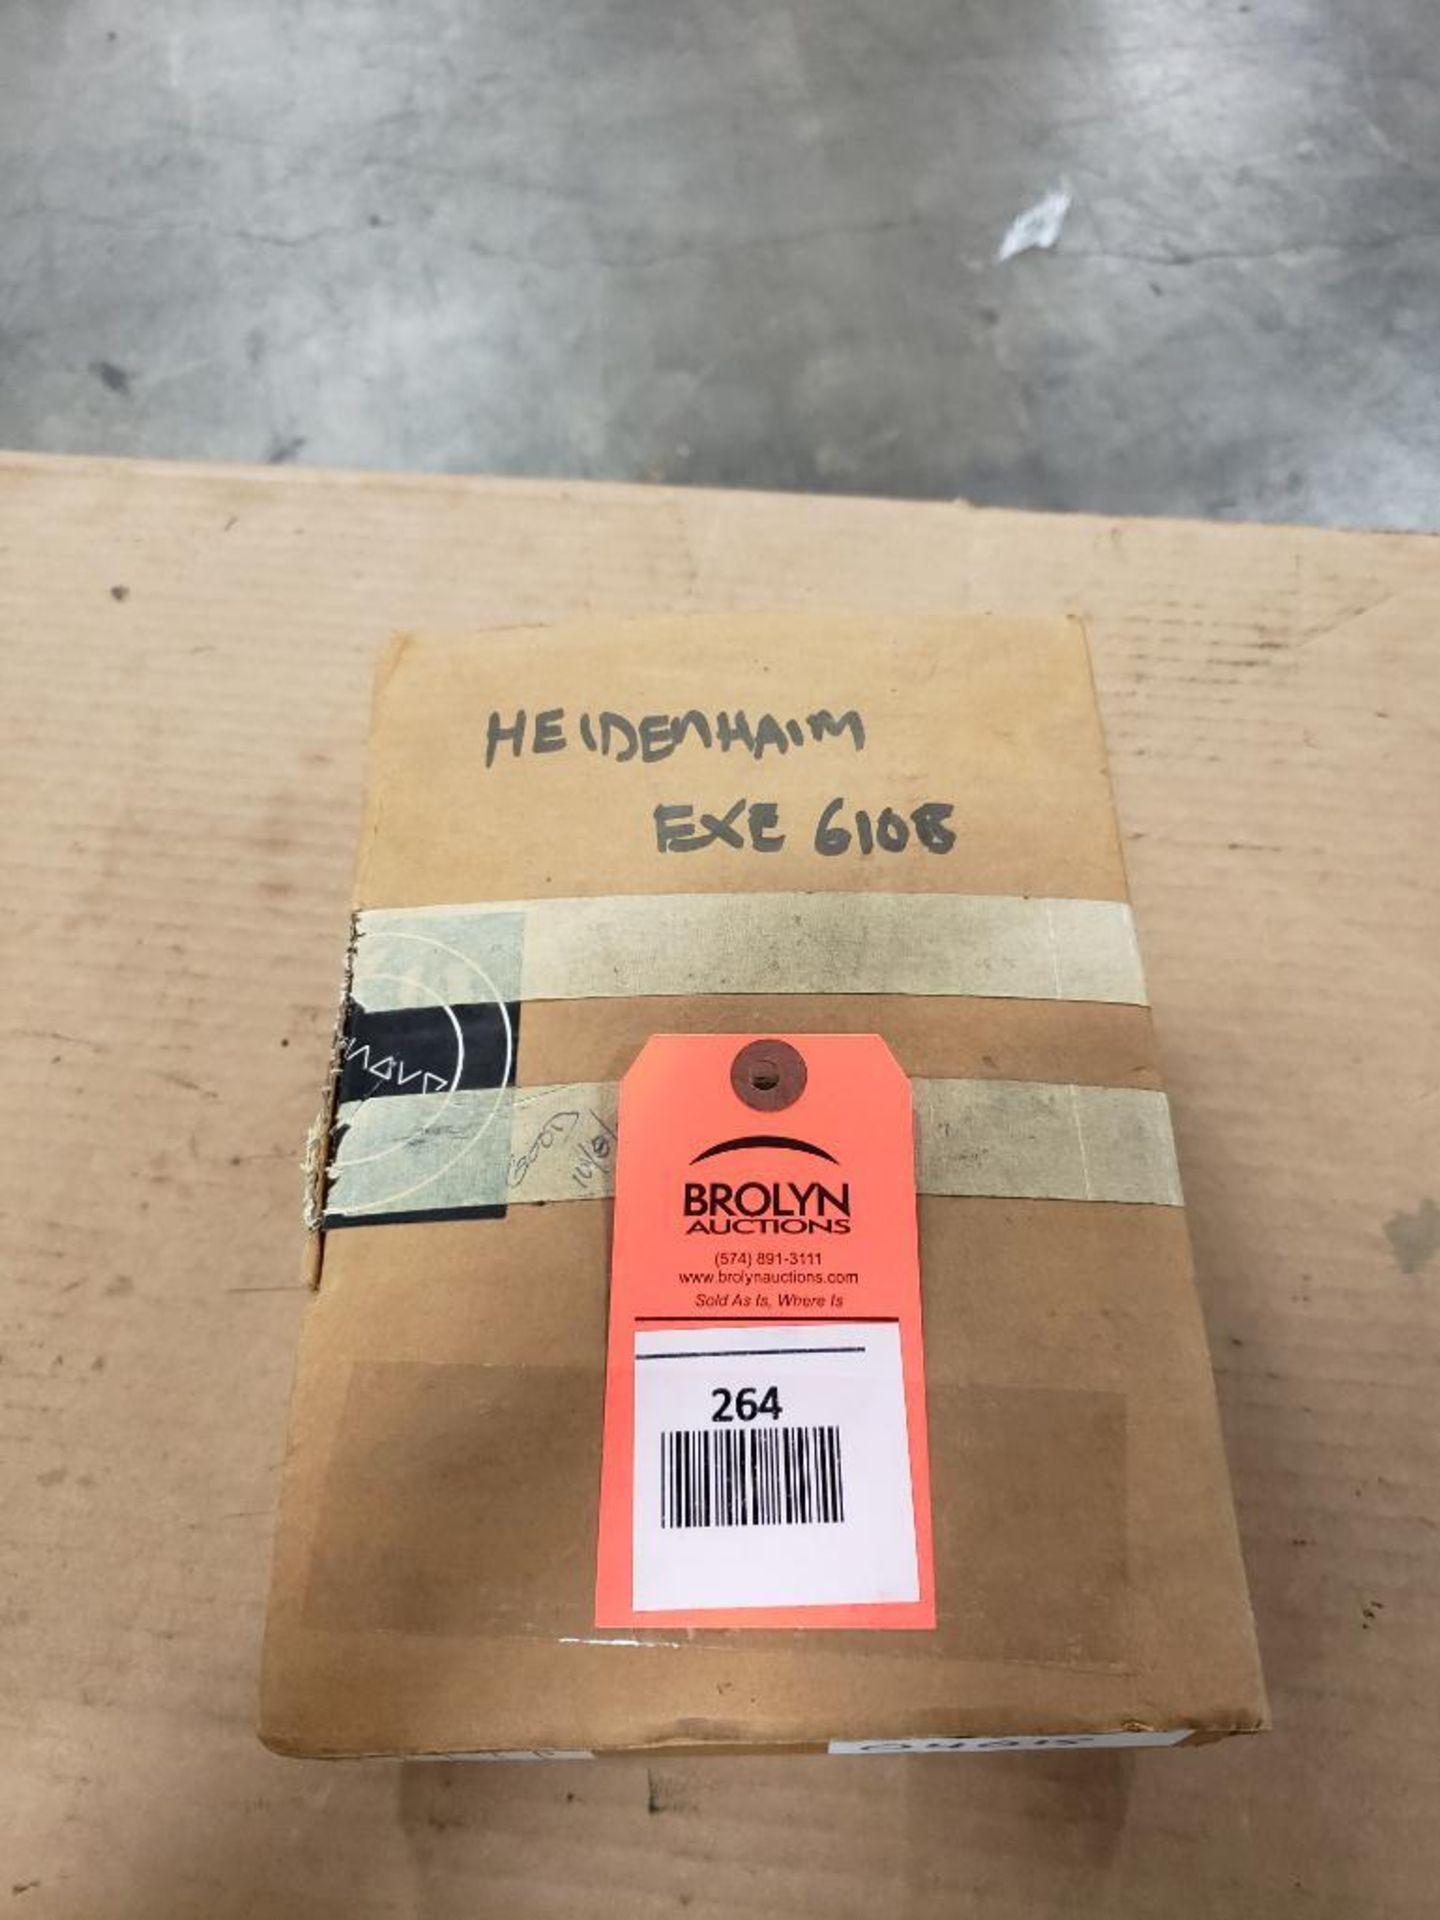 Heidenhain 241-640-01 Interpolation box.